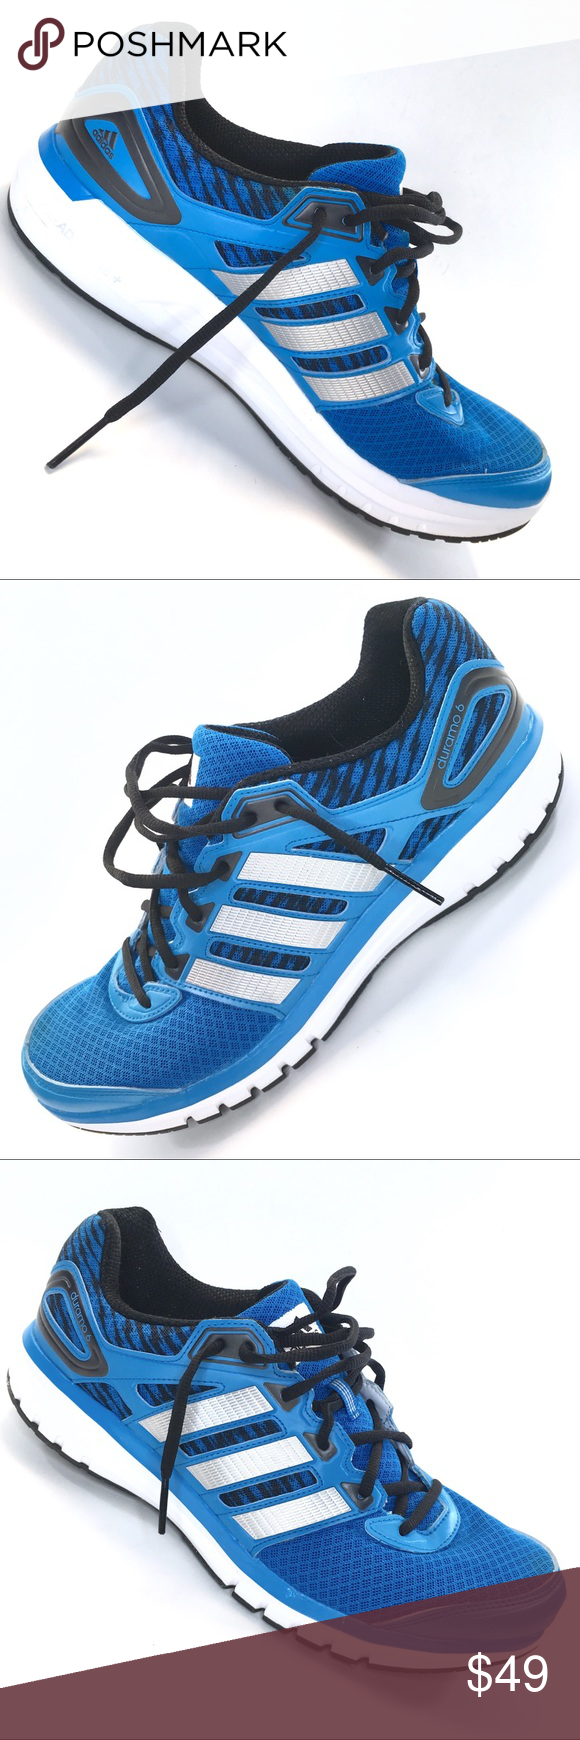 cera eslogan dinastía  adidas ADIPRENE + duramo 6 run strong Blue MENS 12   Shoes sneakers adidas,  Adidas, Blue adidas